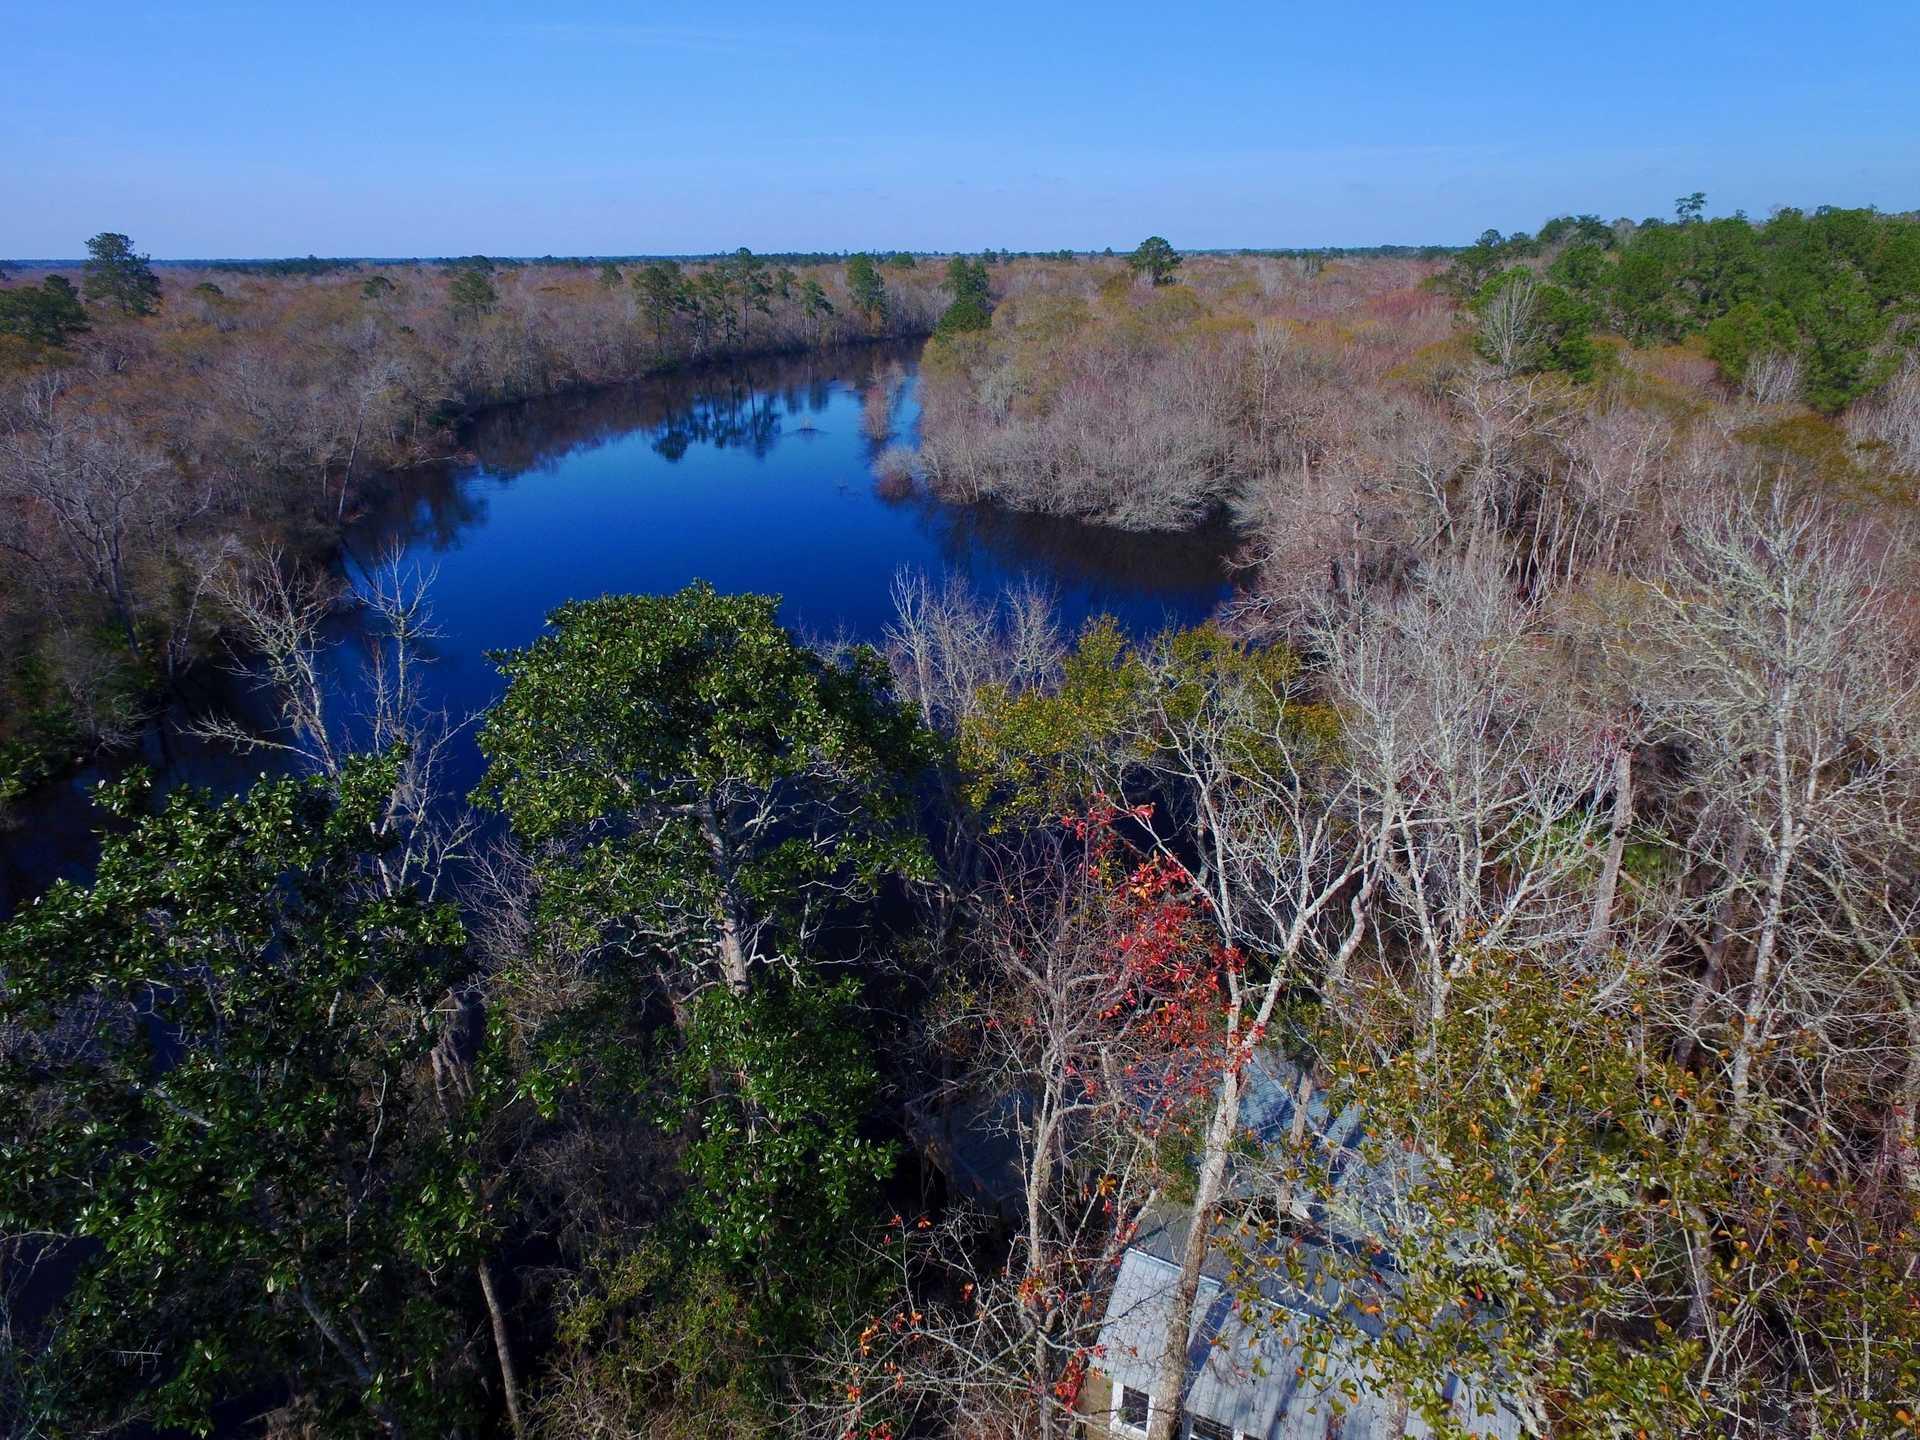 Satilla River Bluff Deepwater Home image